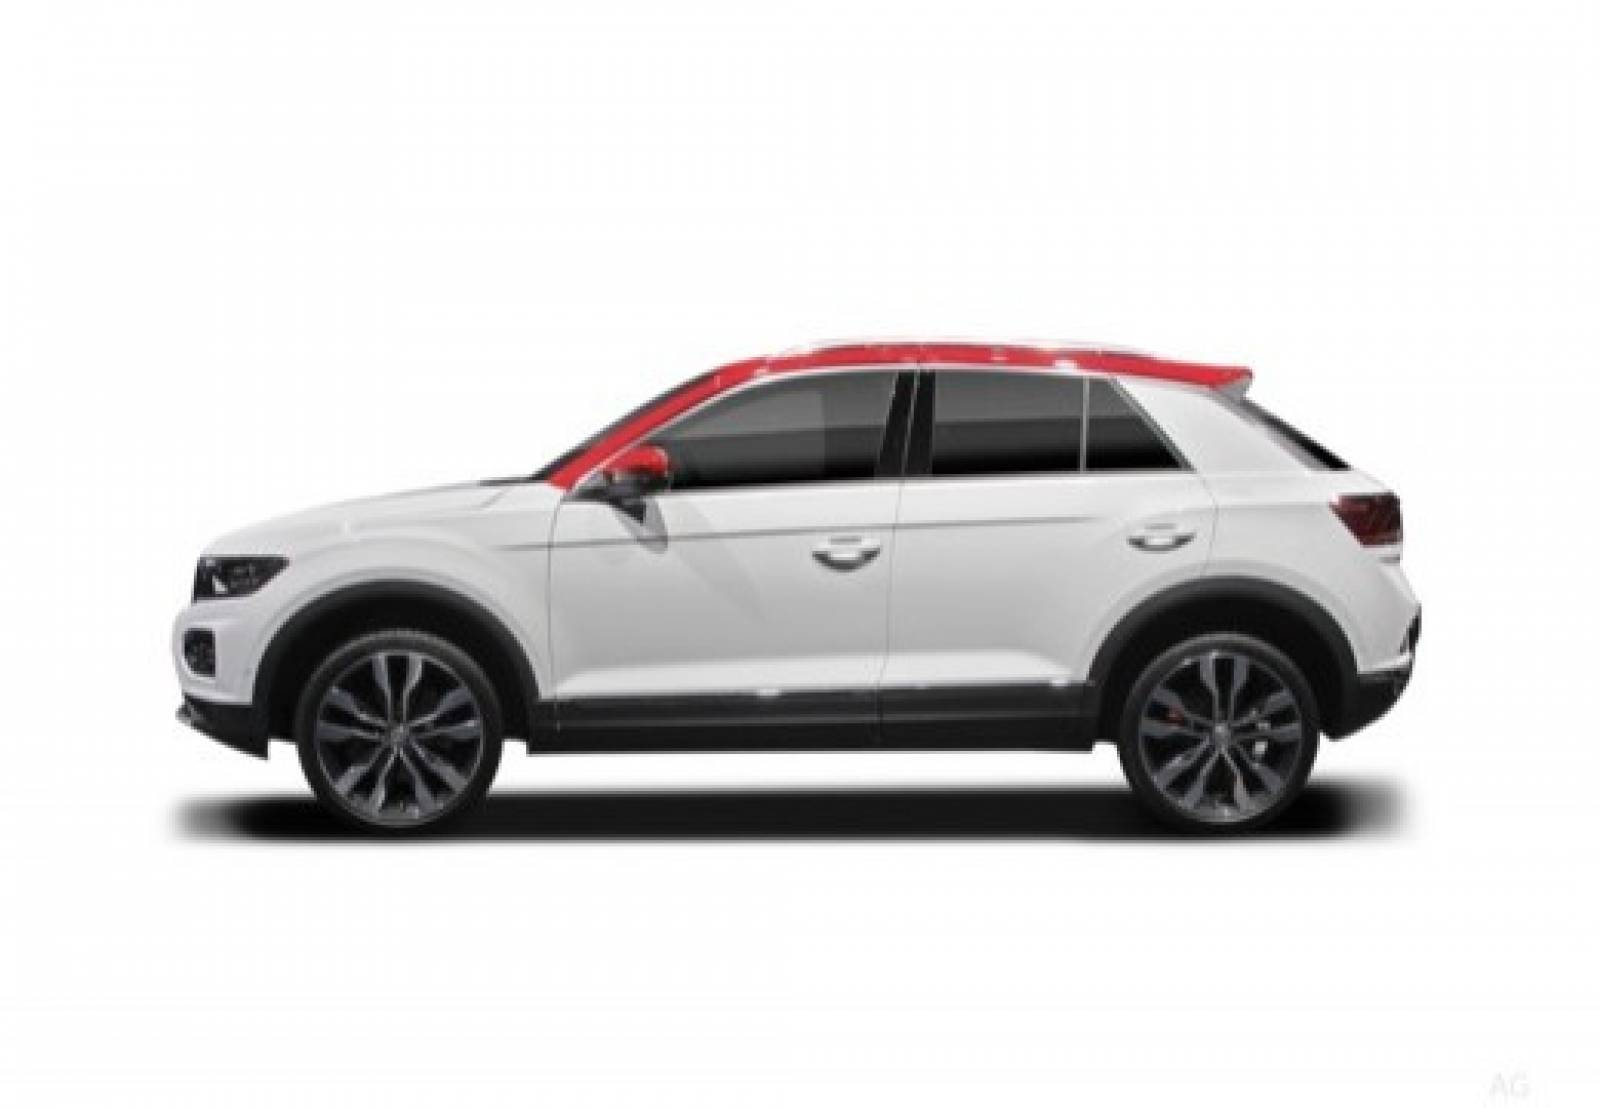 VOLKSWAGEN T-Roc 1.5 TSI 150 EVO Start/Stop DSG7 - véhicule neuf - LEMAUVIEL AUTOMOBILES - Présentation site web V2 - Lemauviel Automobiles - VIRE - 14500 - VIRE - 5